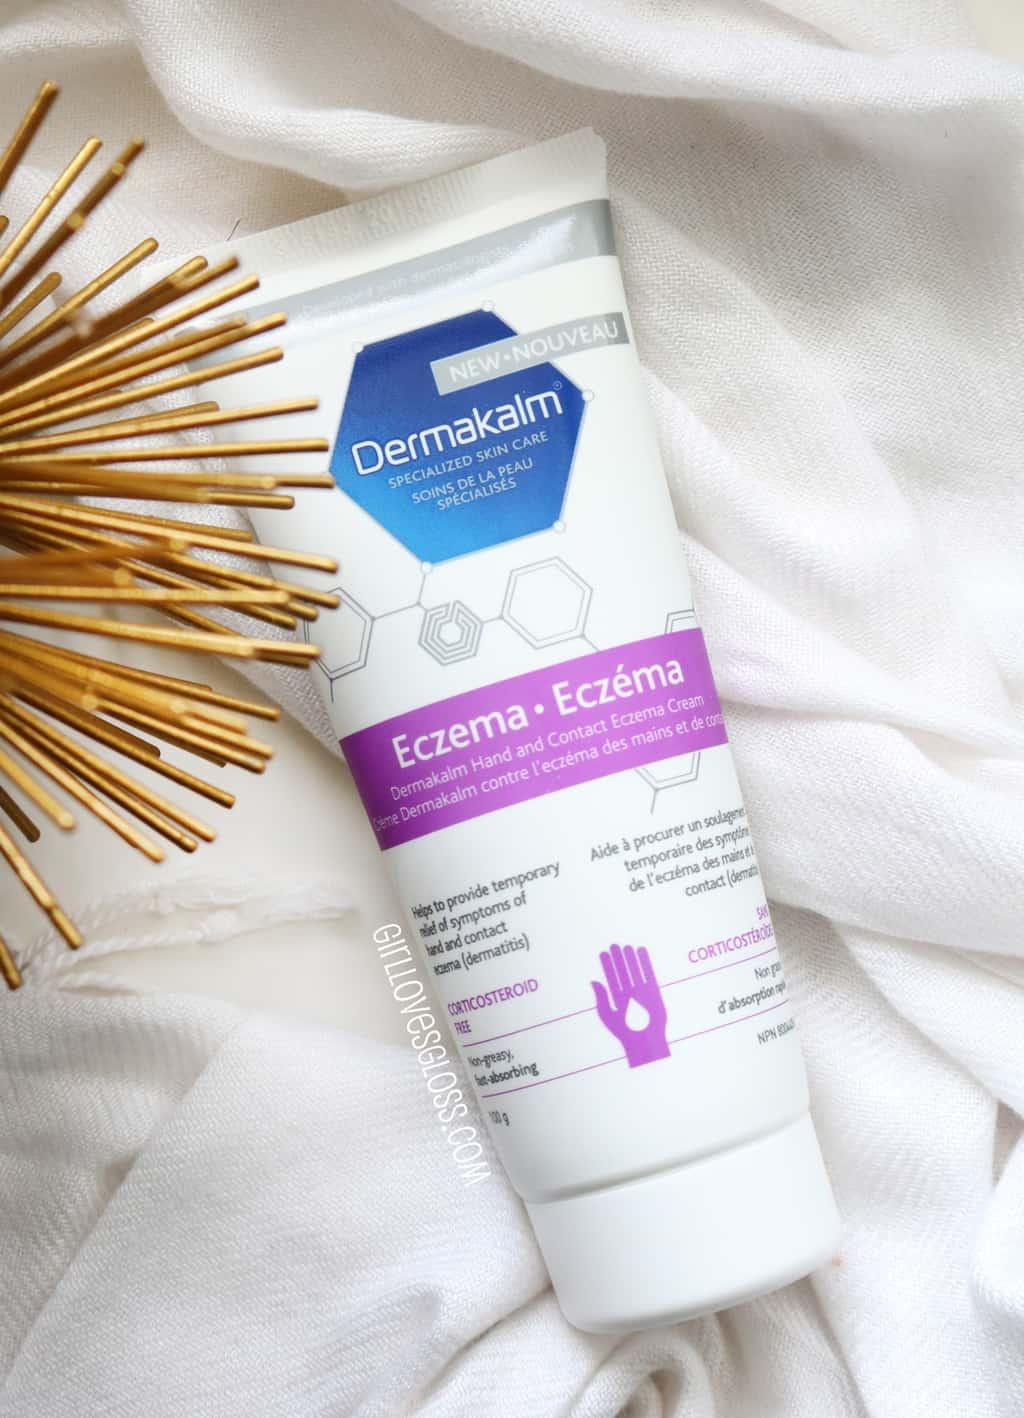 Dermakalm Eczema Handcream